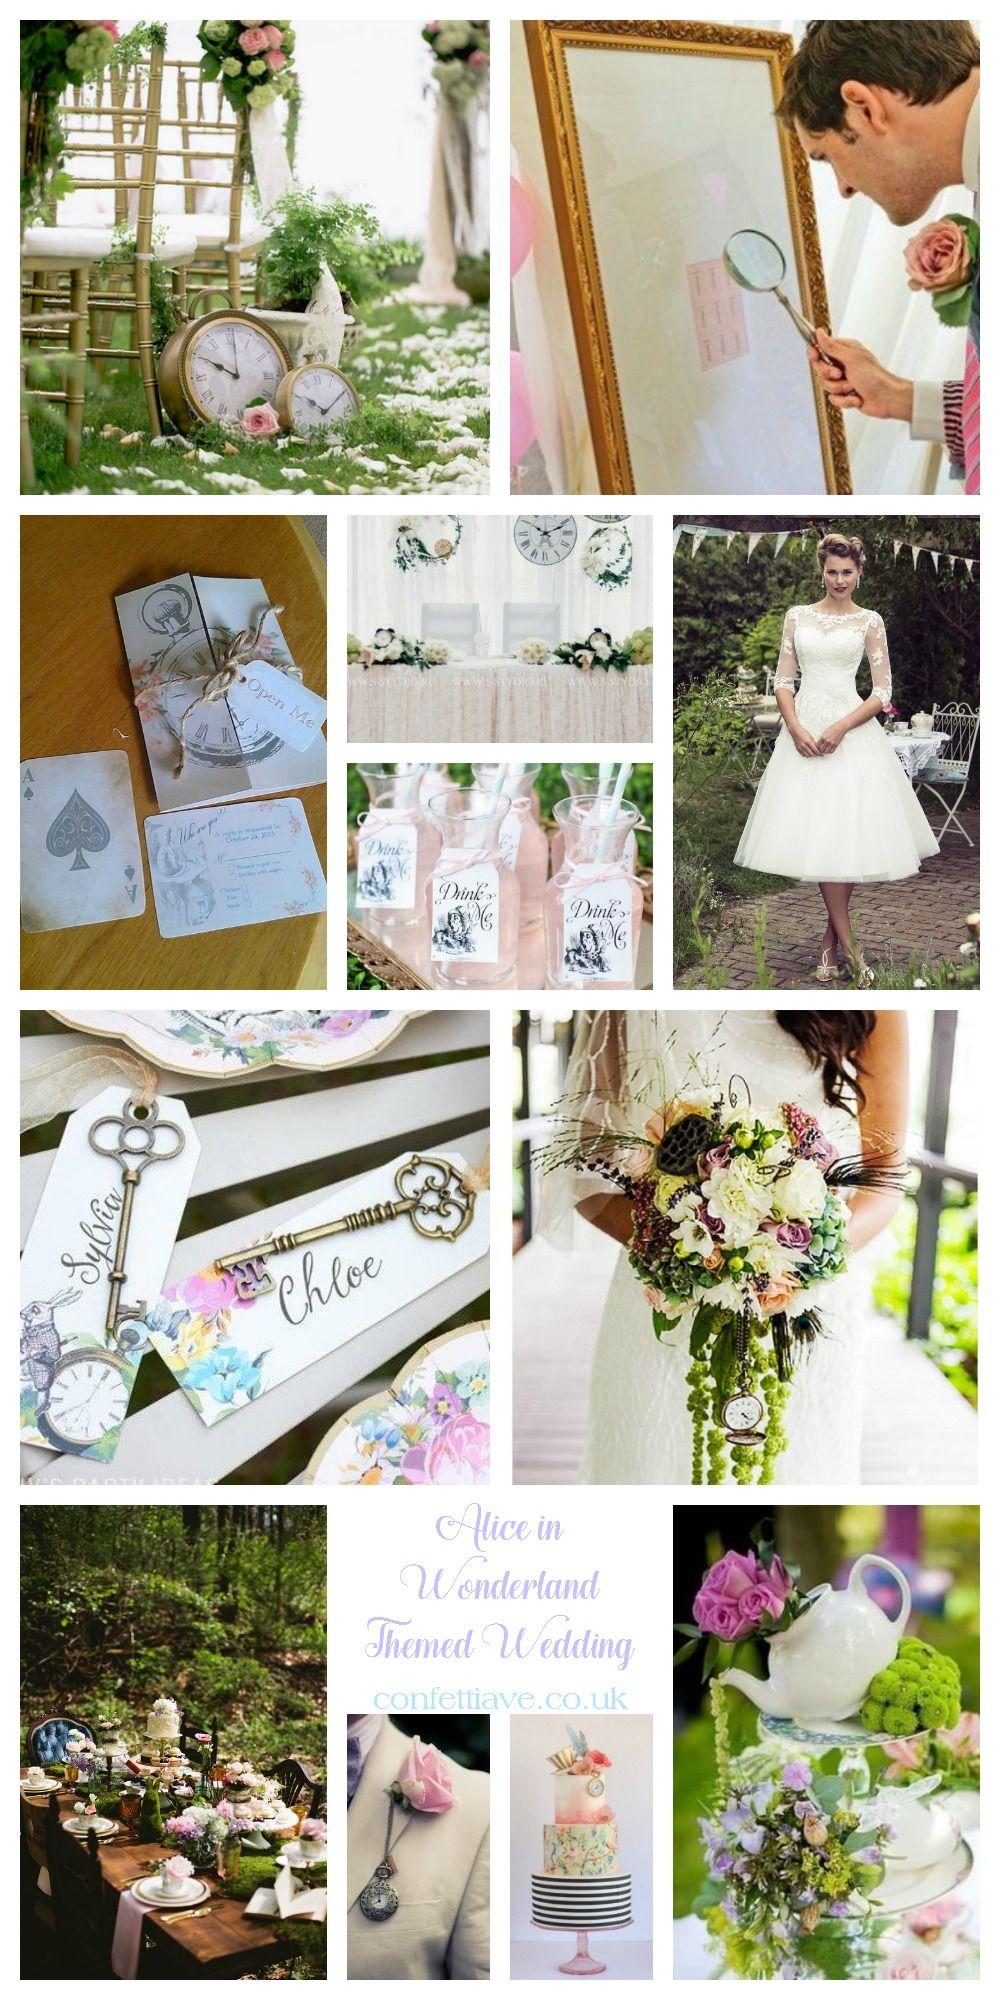 Alice In Wonderland Themed Wedding | Mood Board http://confettiave ...